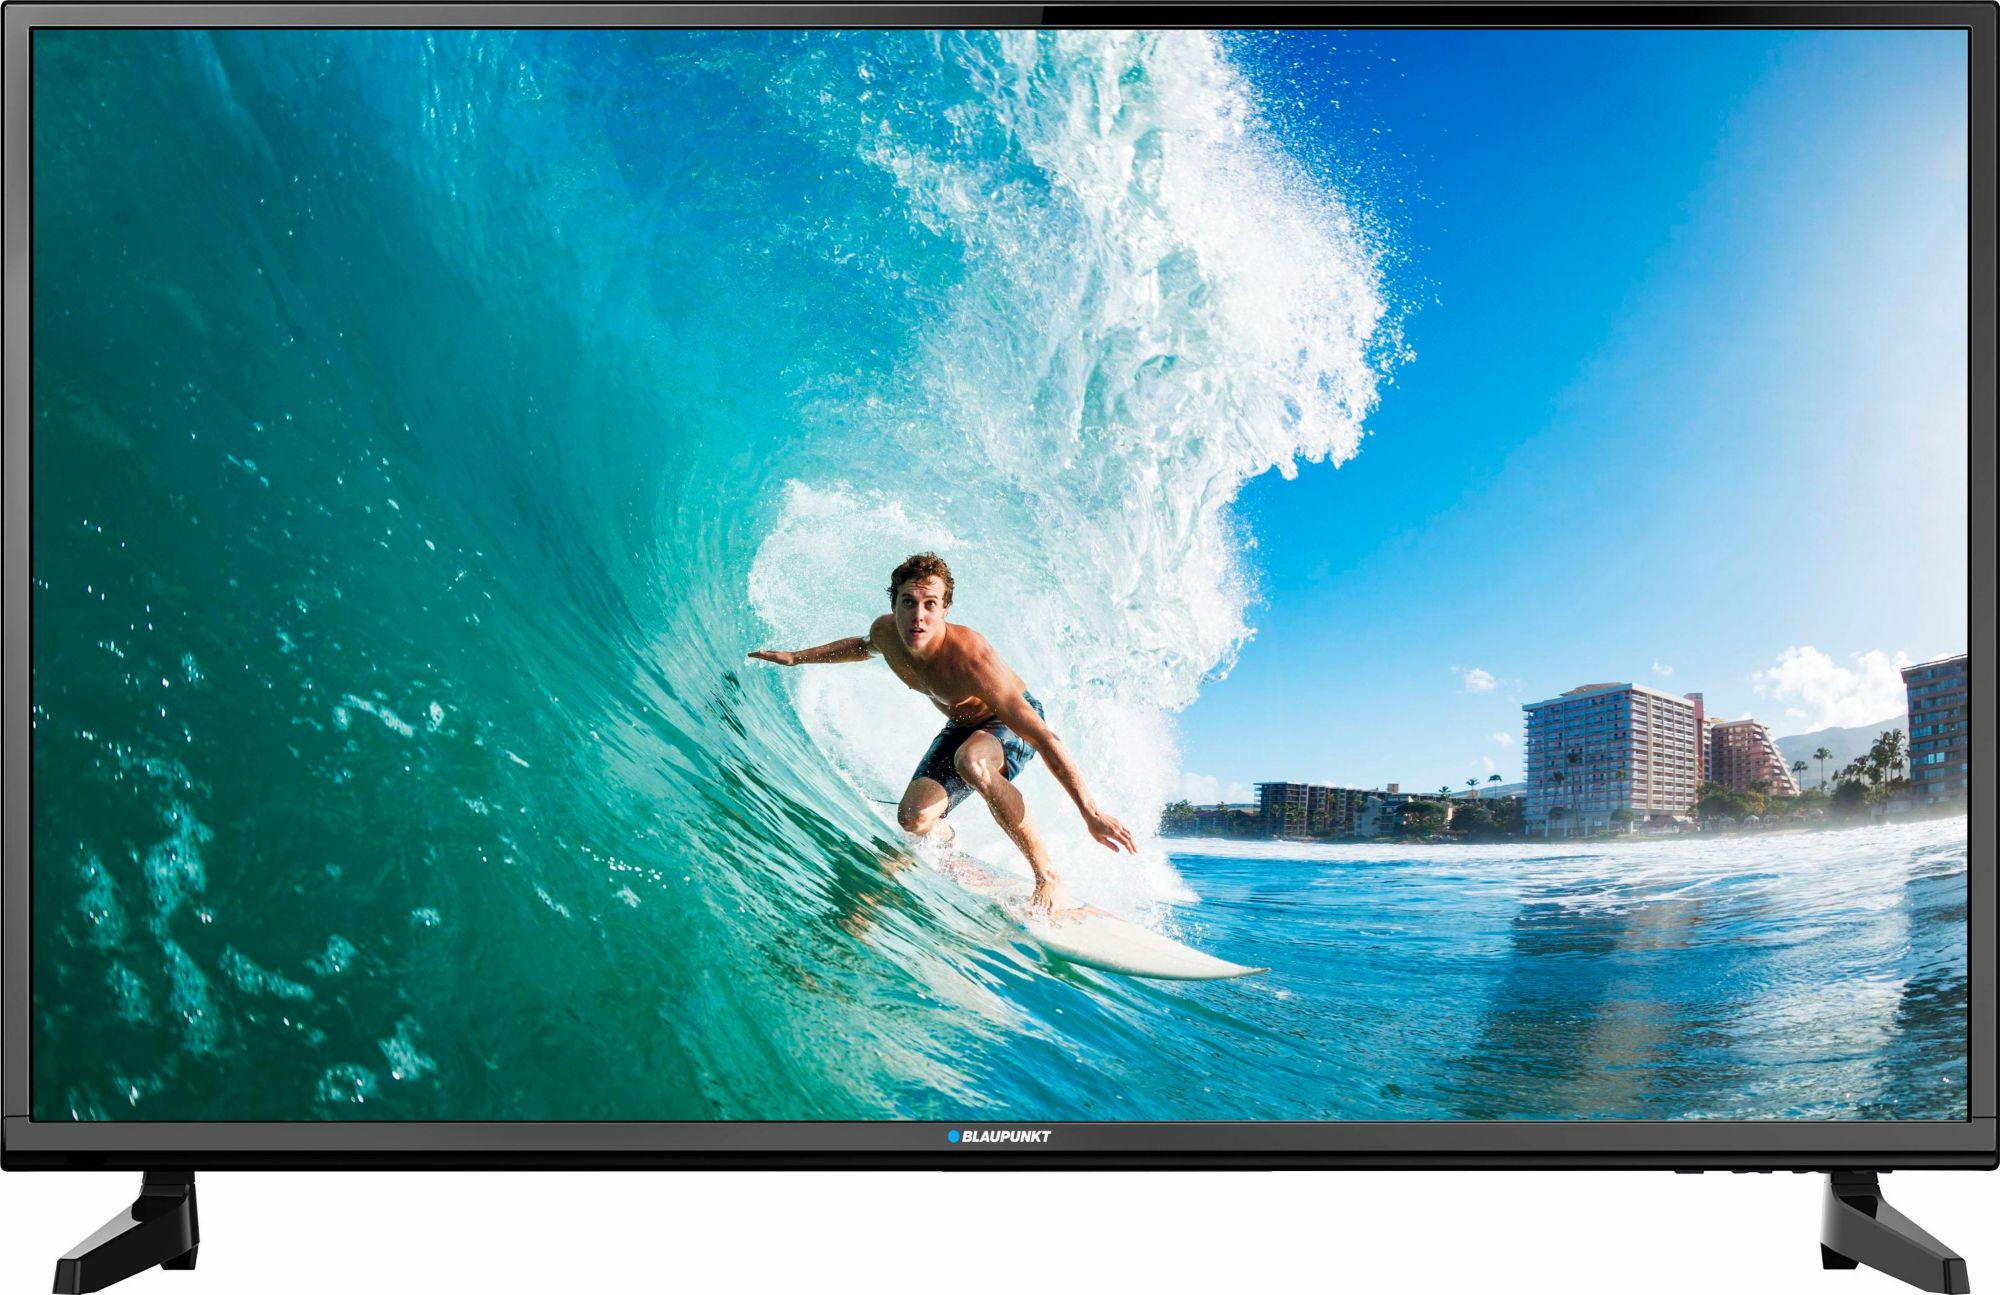 BLAUPUNKT Blaupunkt B49M148T2CS Smart, LED Fernseher, 123 cm (49 Zoll), 1080p (Full HD), Smart-TV